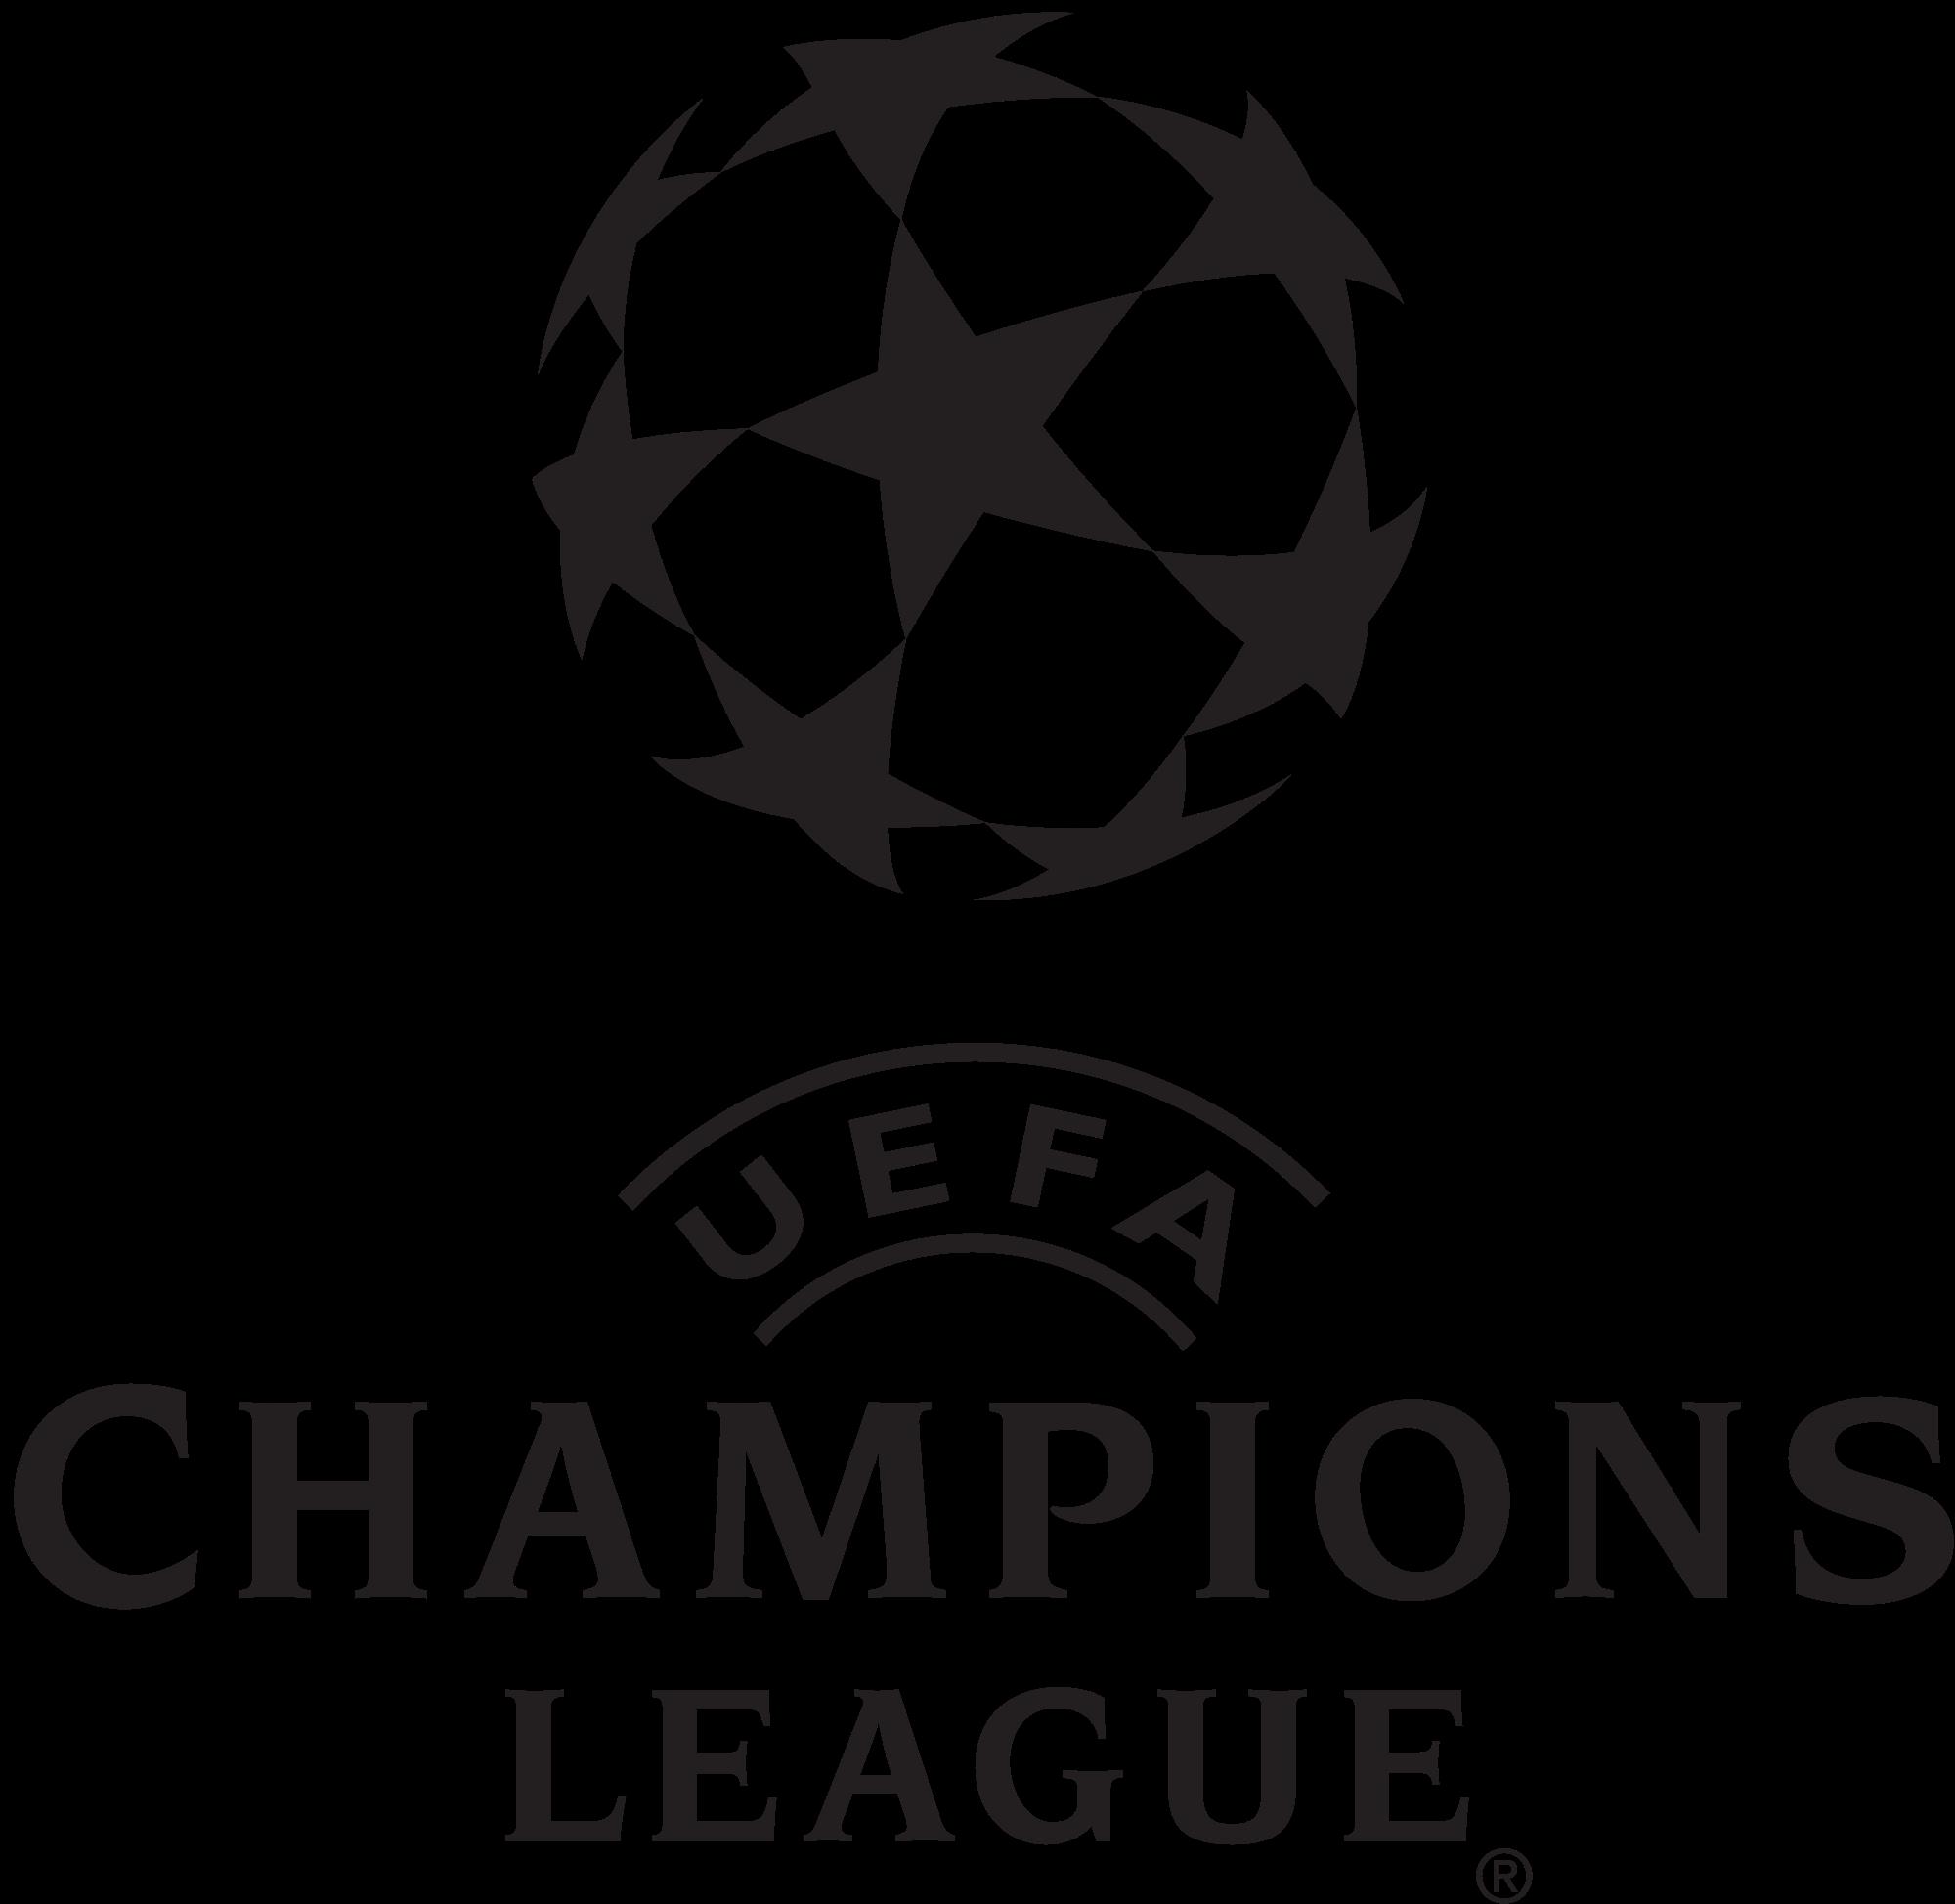 Uefa Champions League - 2013 UEFA_Champions_League